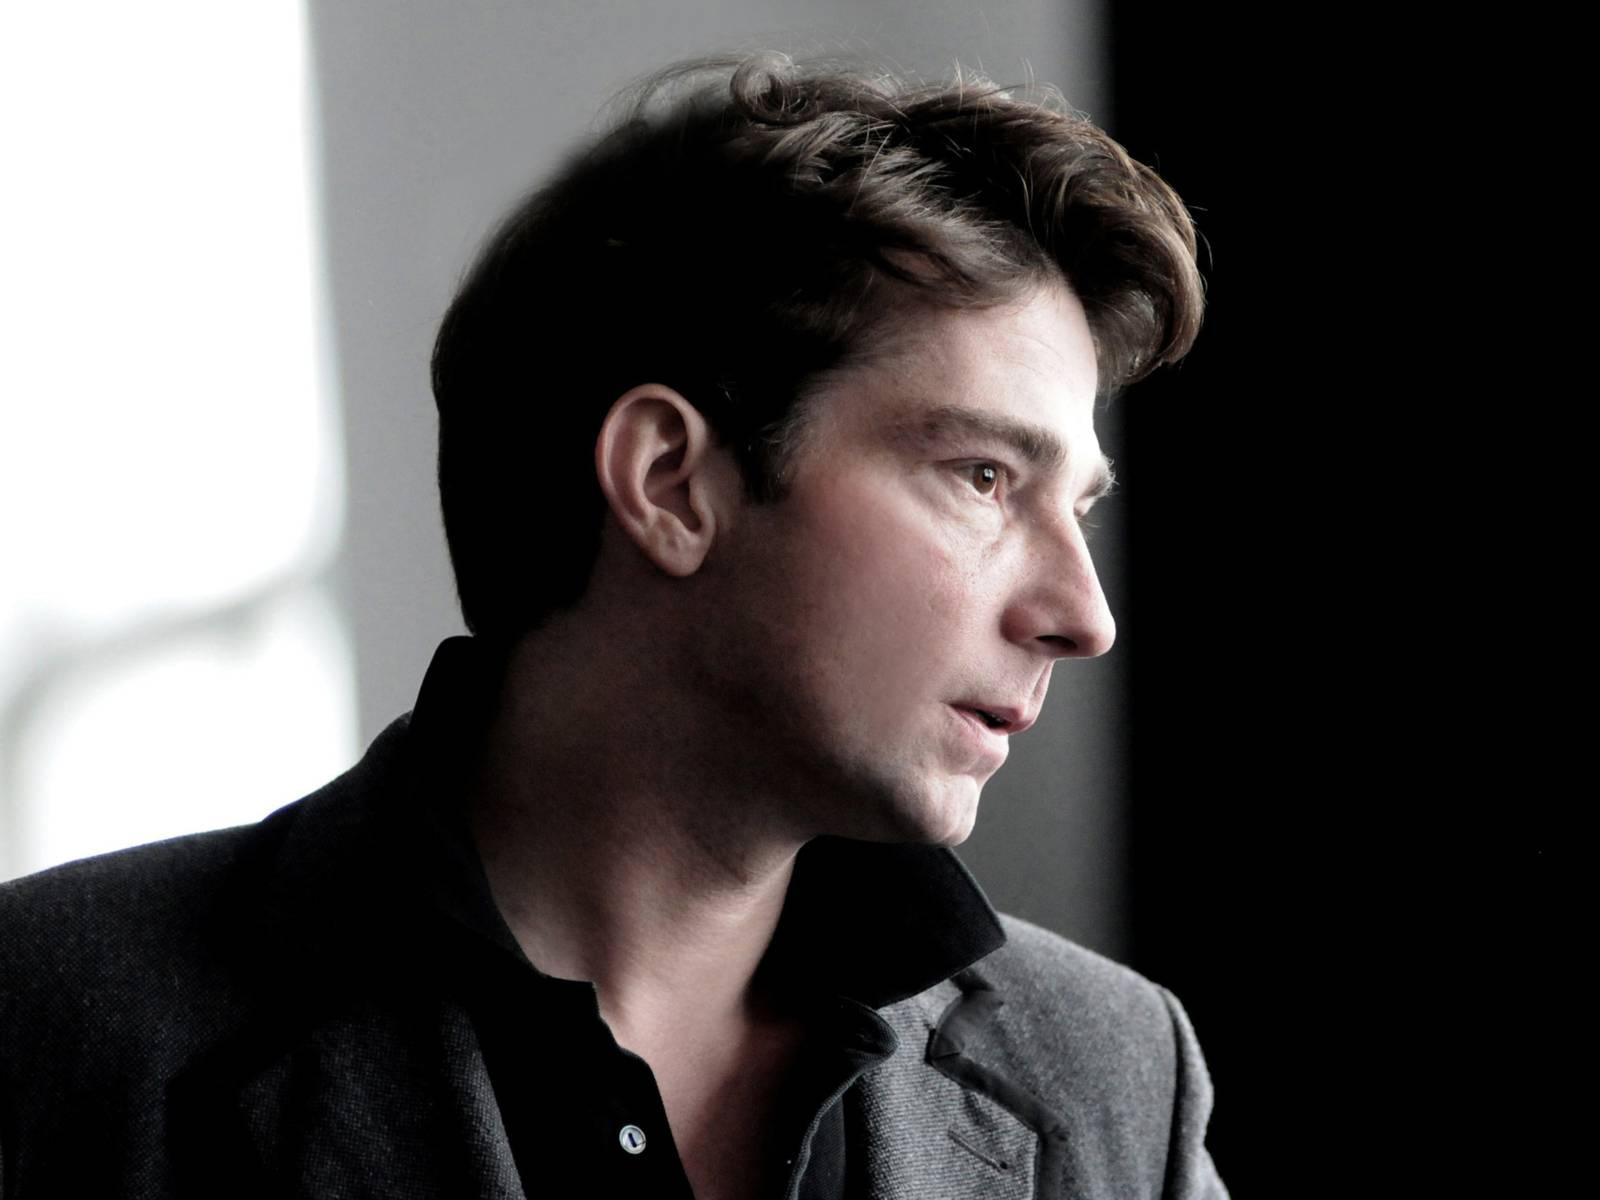 Marco Goecke, Direktor des Staatsballetts Hannover, im Profil